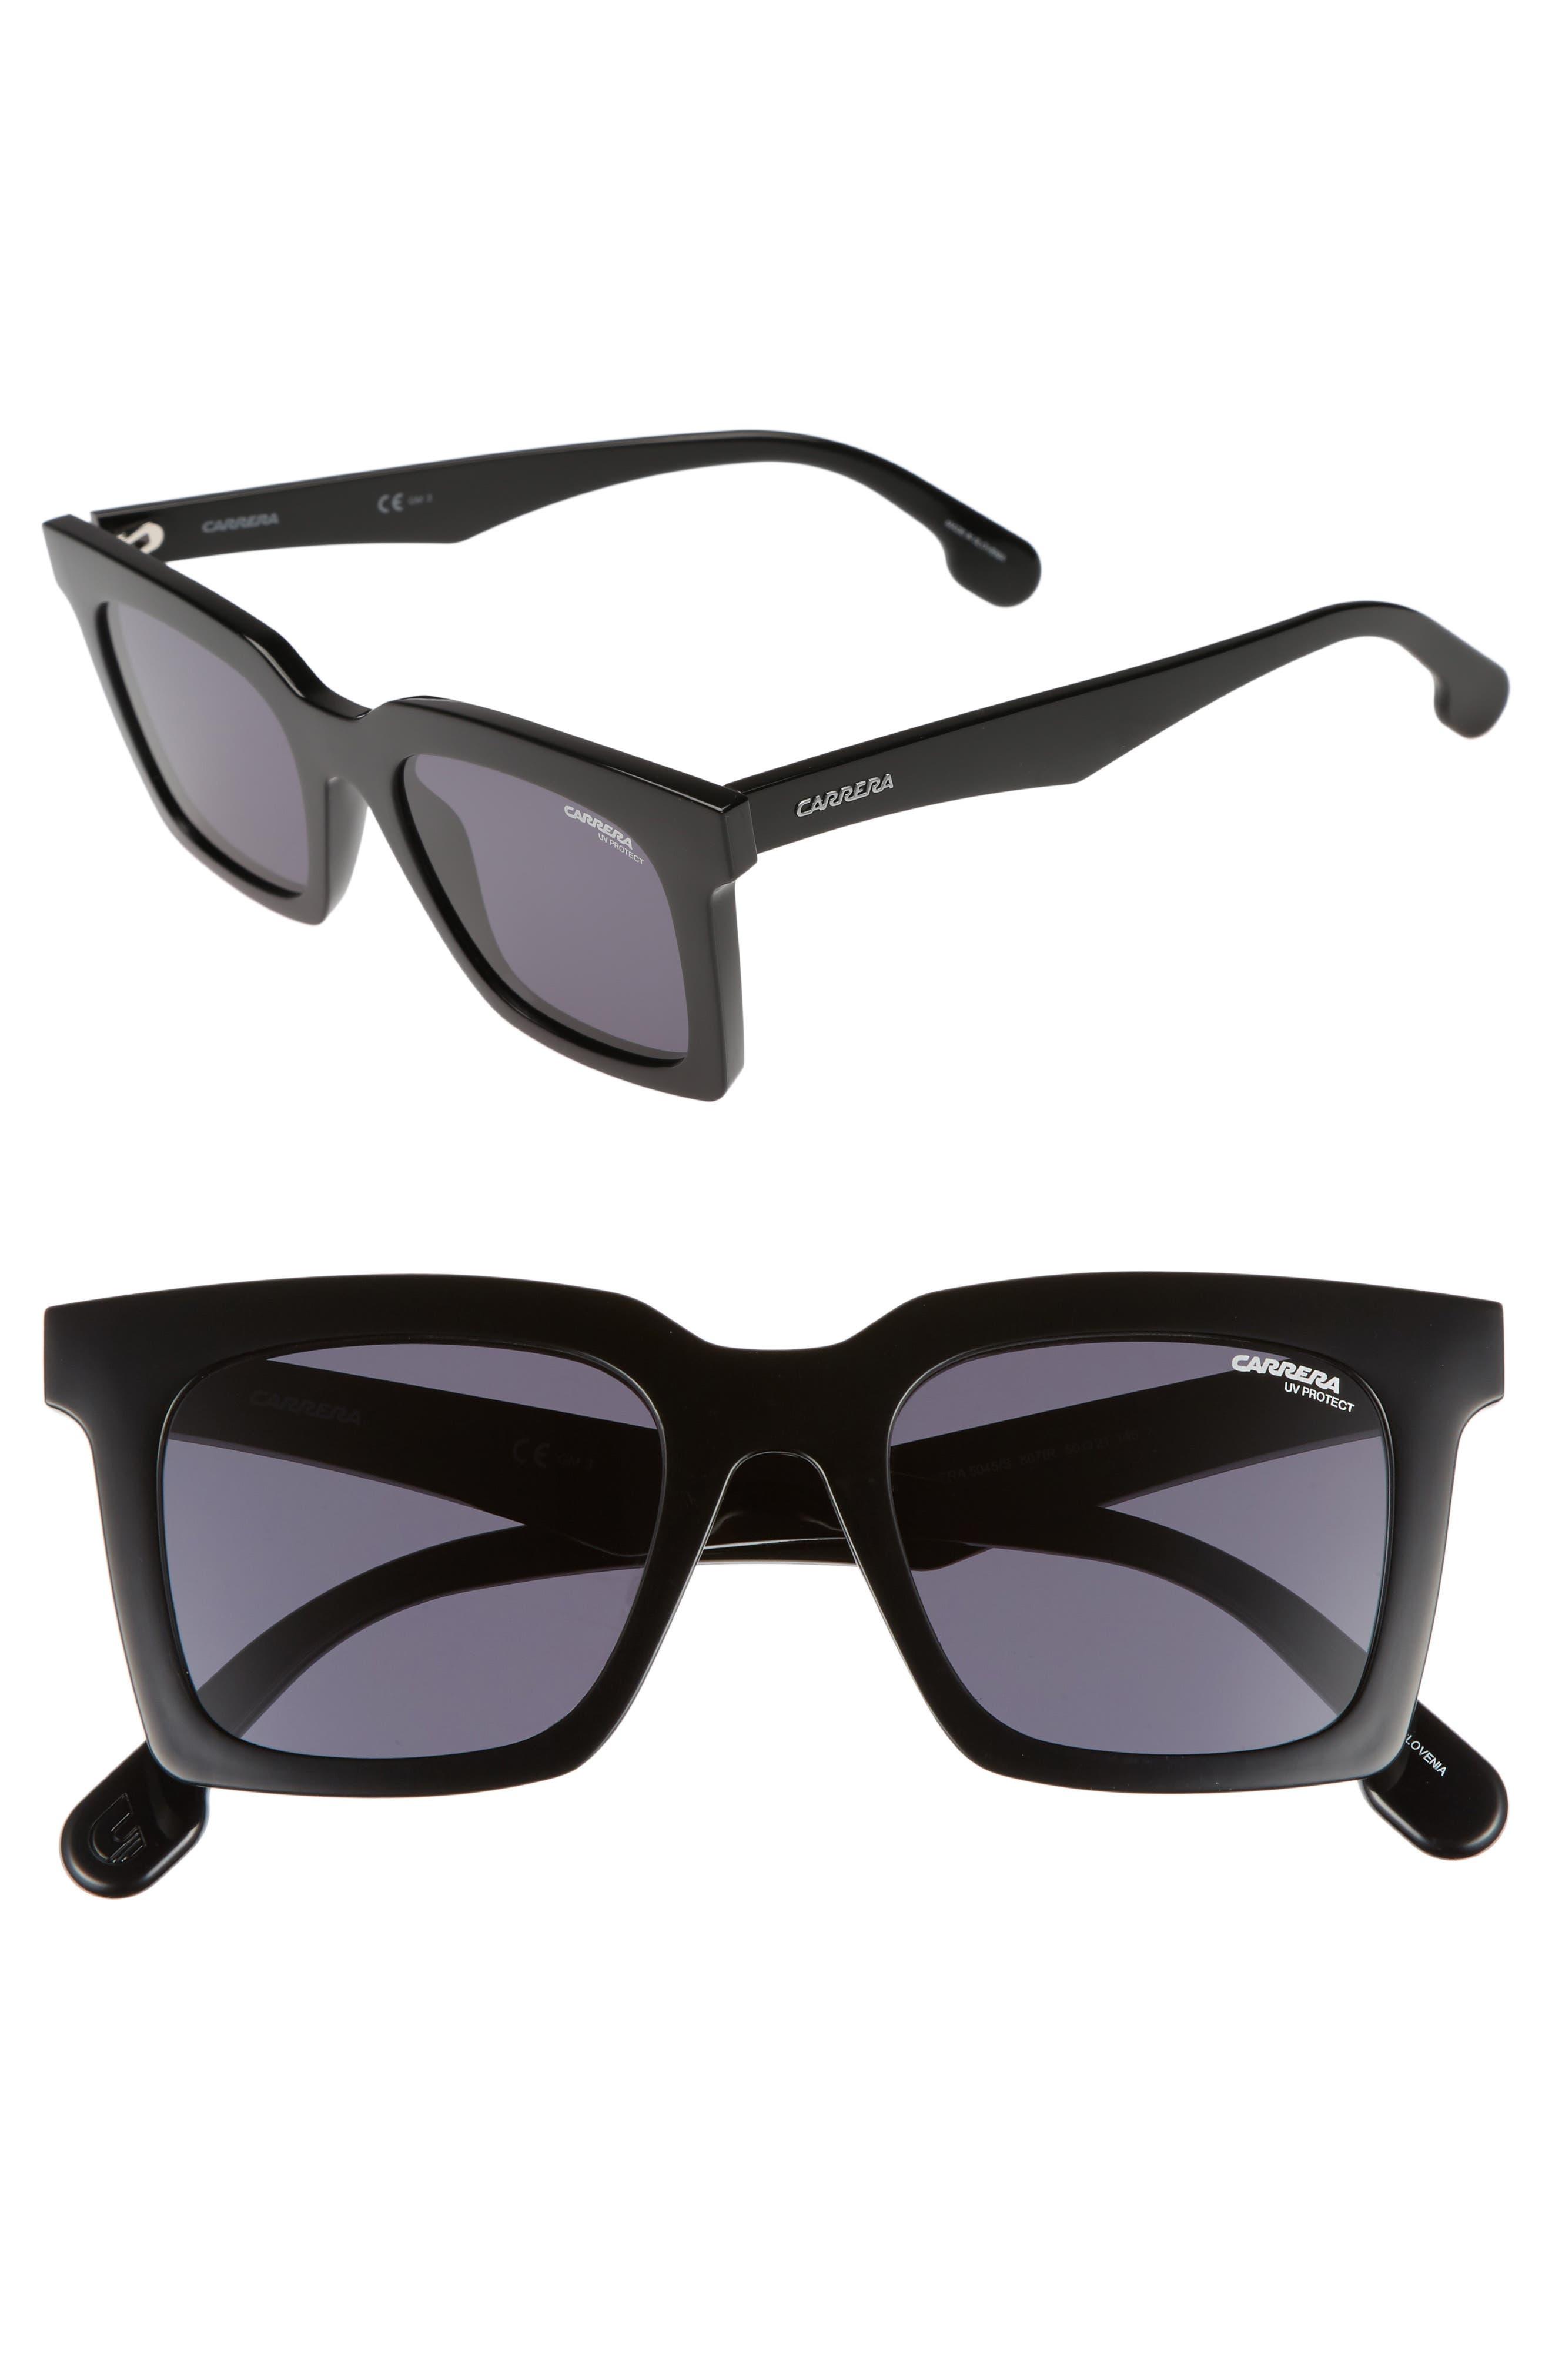 5045S 50mm Sunglasses,                             Main thumbnail 1, color,                             Black/ Gray Blue